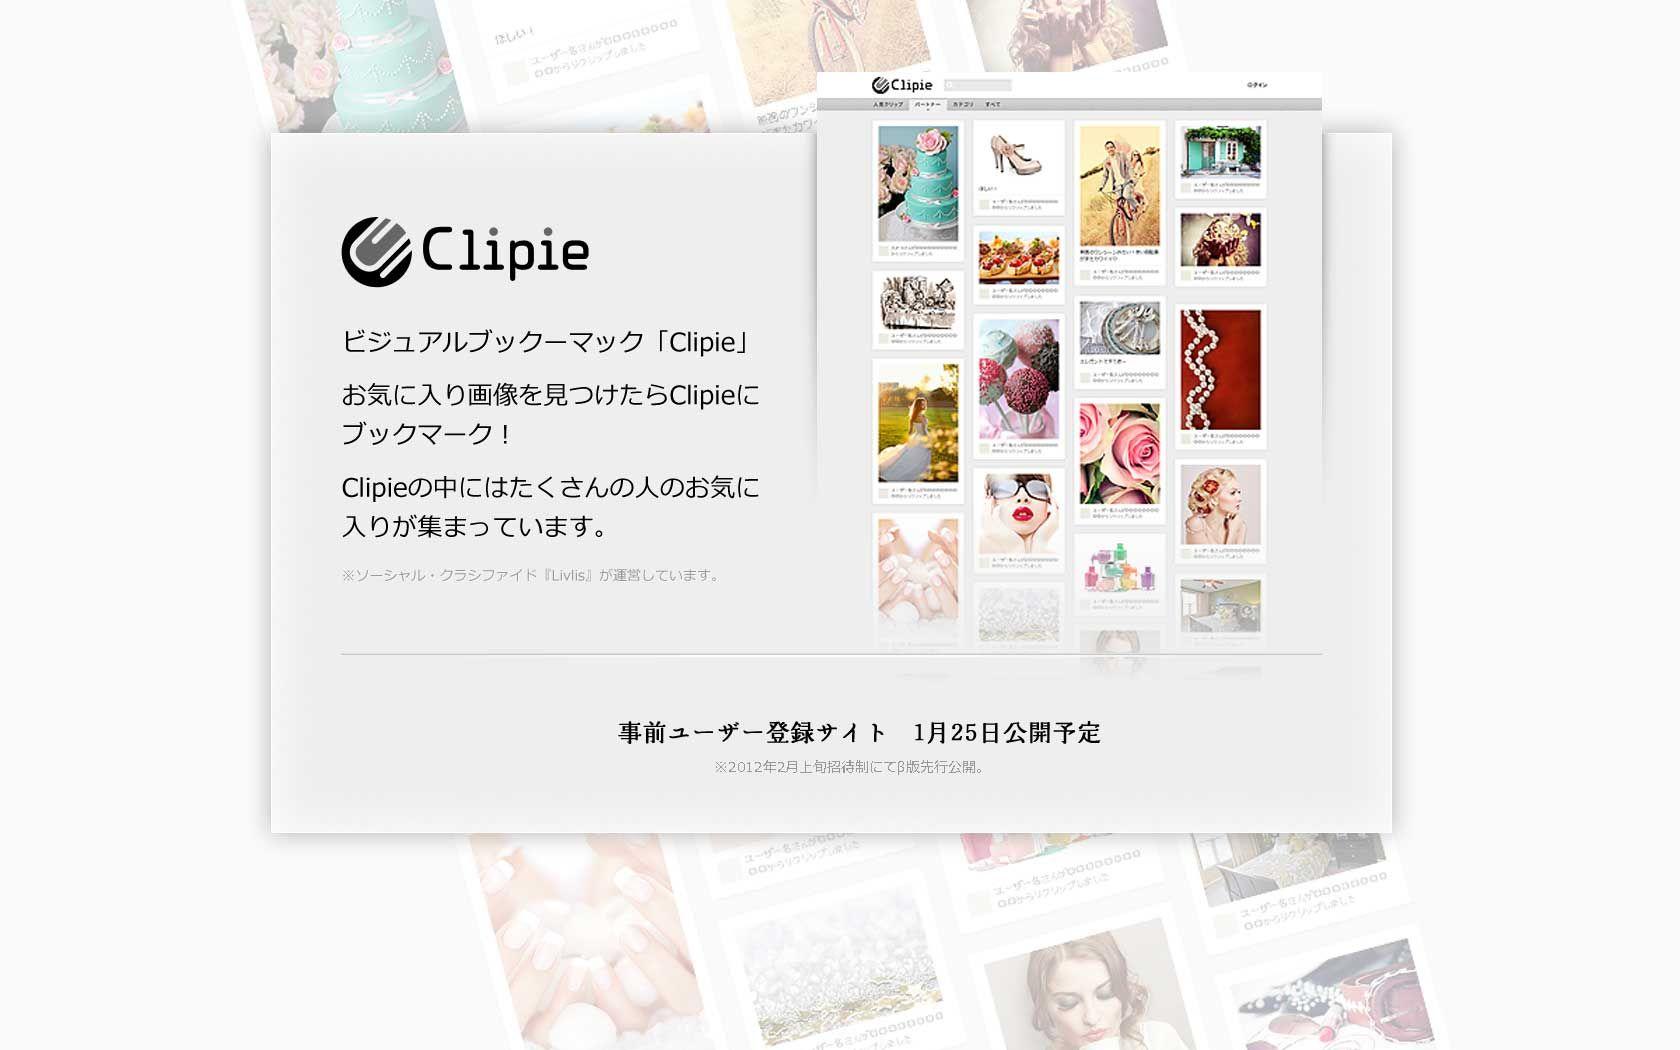 clipie.it